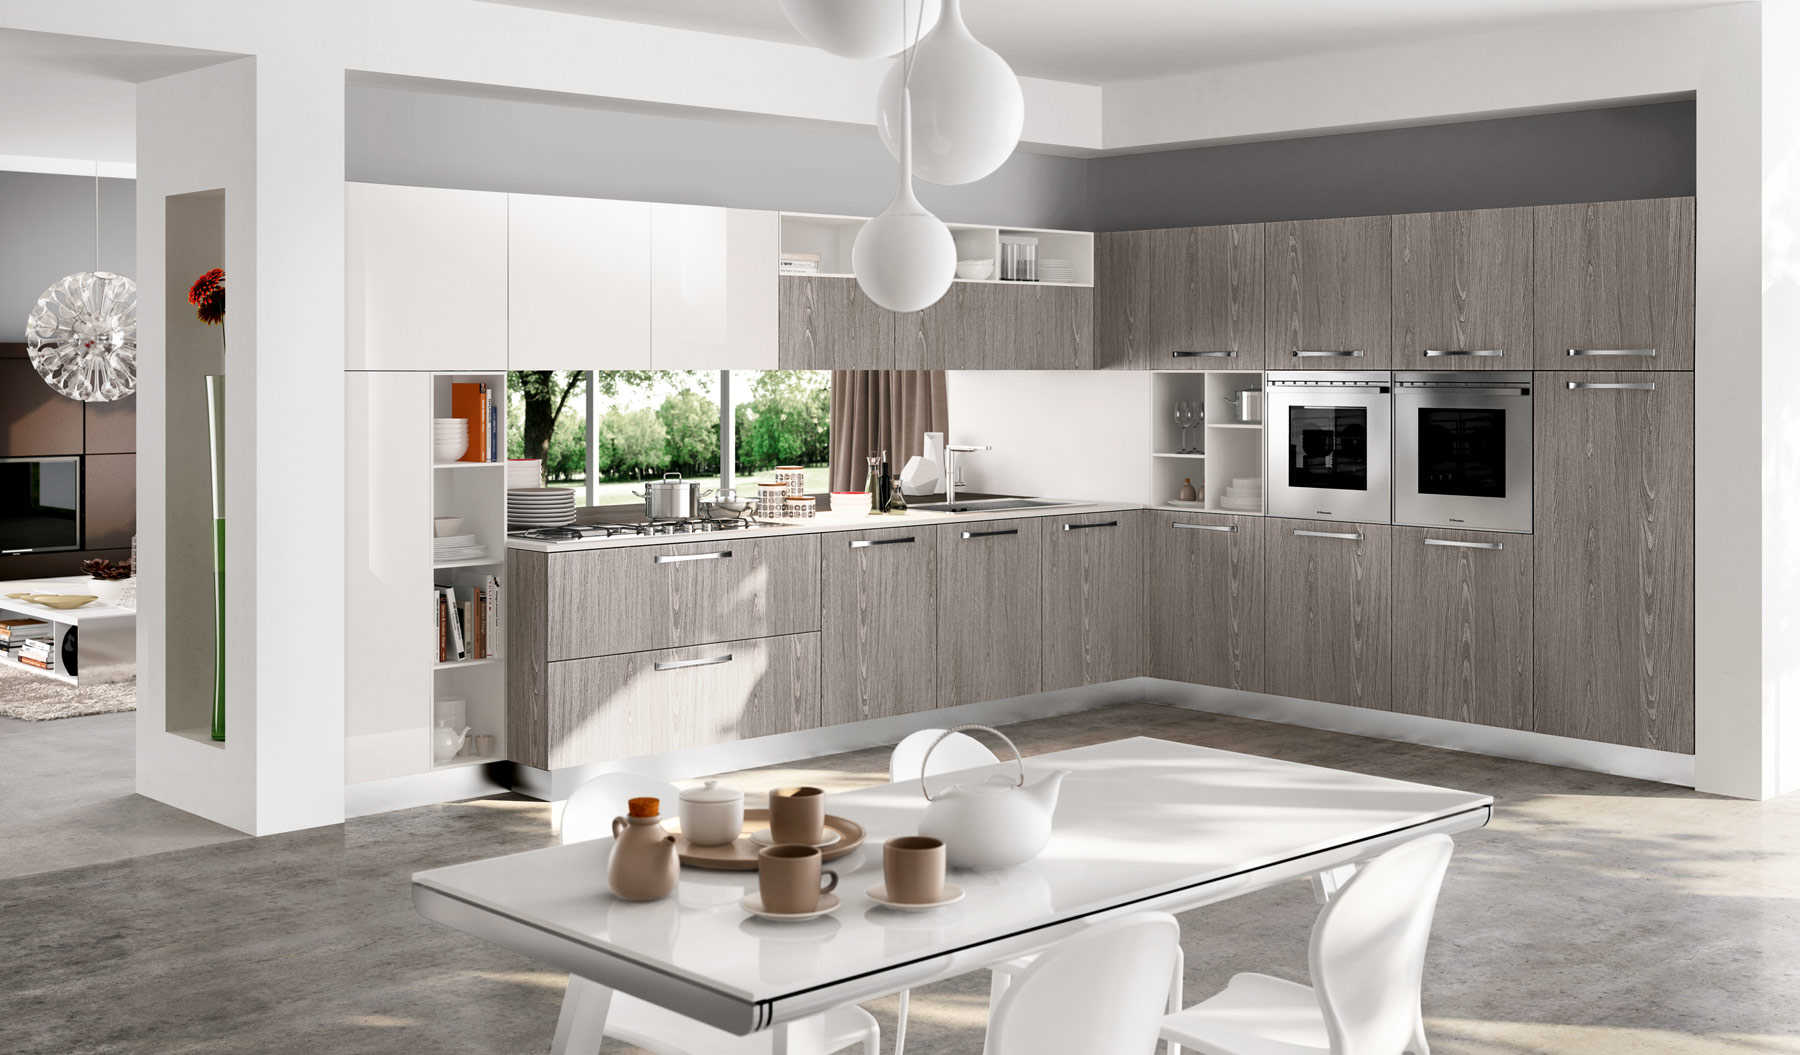 Cucina moderna Wood  Negozio Arredamento